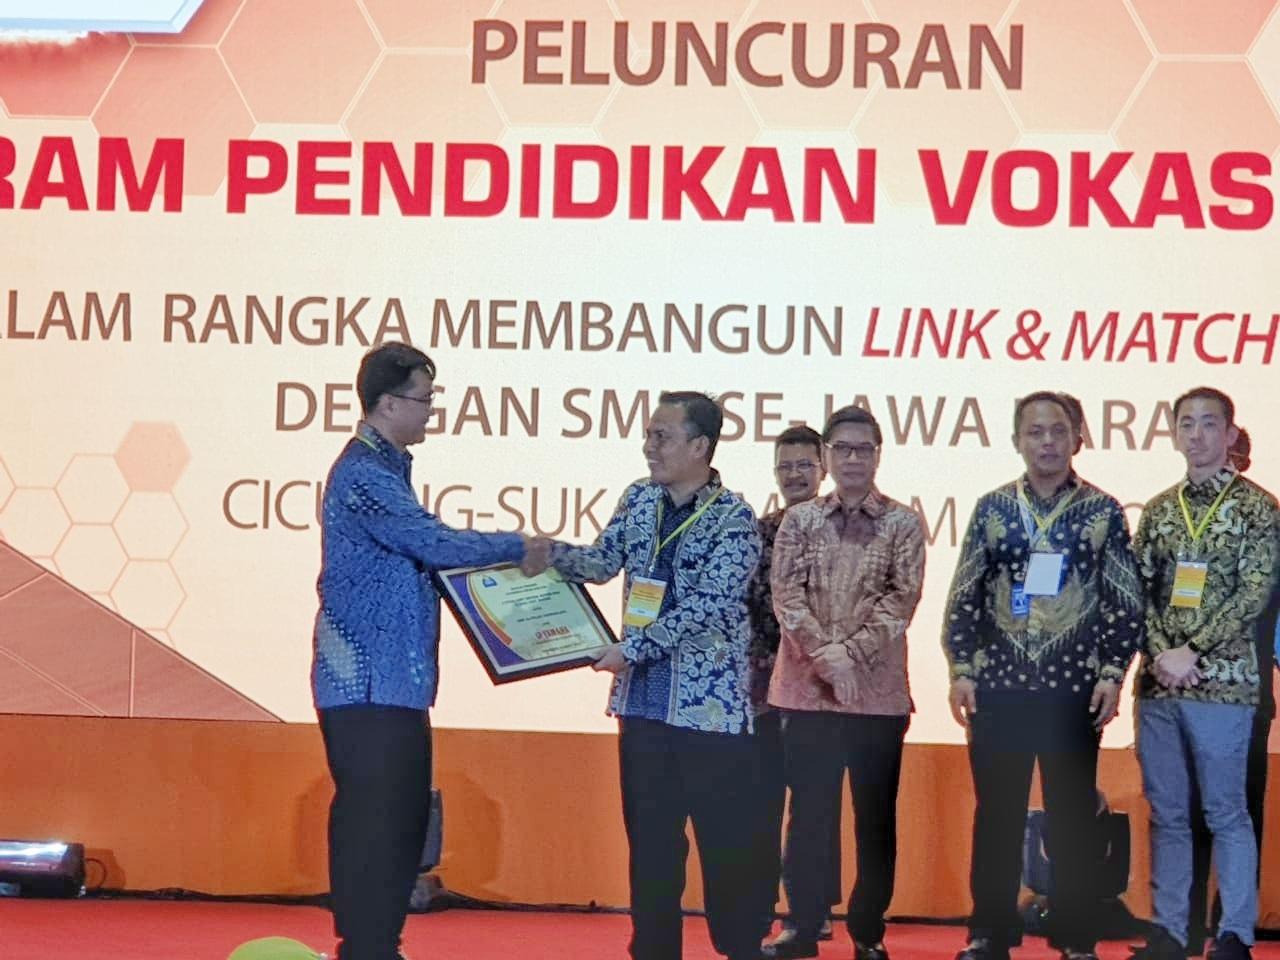 Yamaha Indonesia Konsisten Dukung Program Pendidikan Vokasi Industri di Jawa Barat